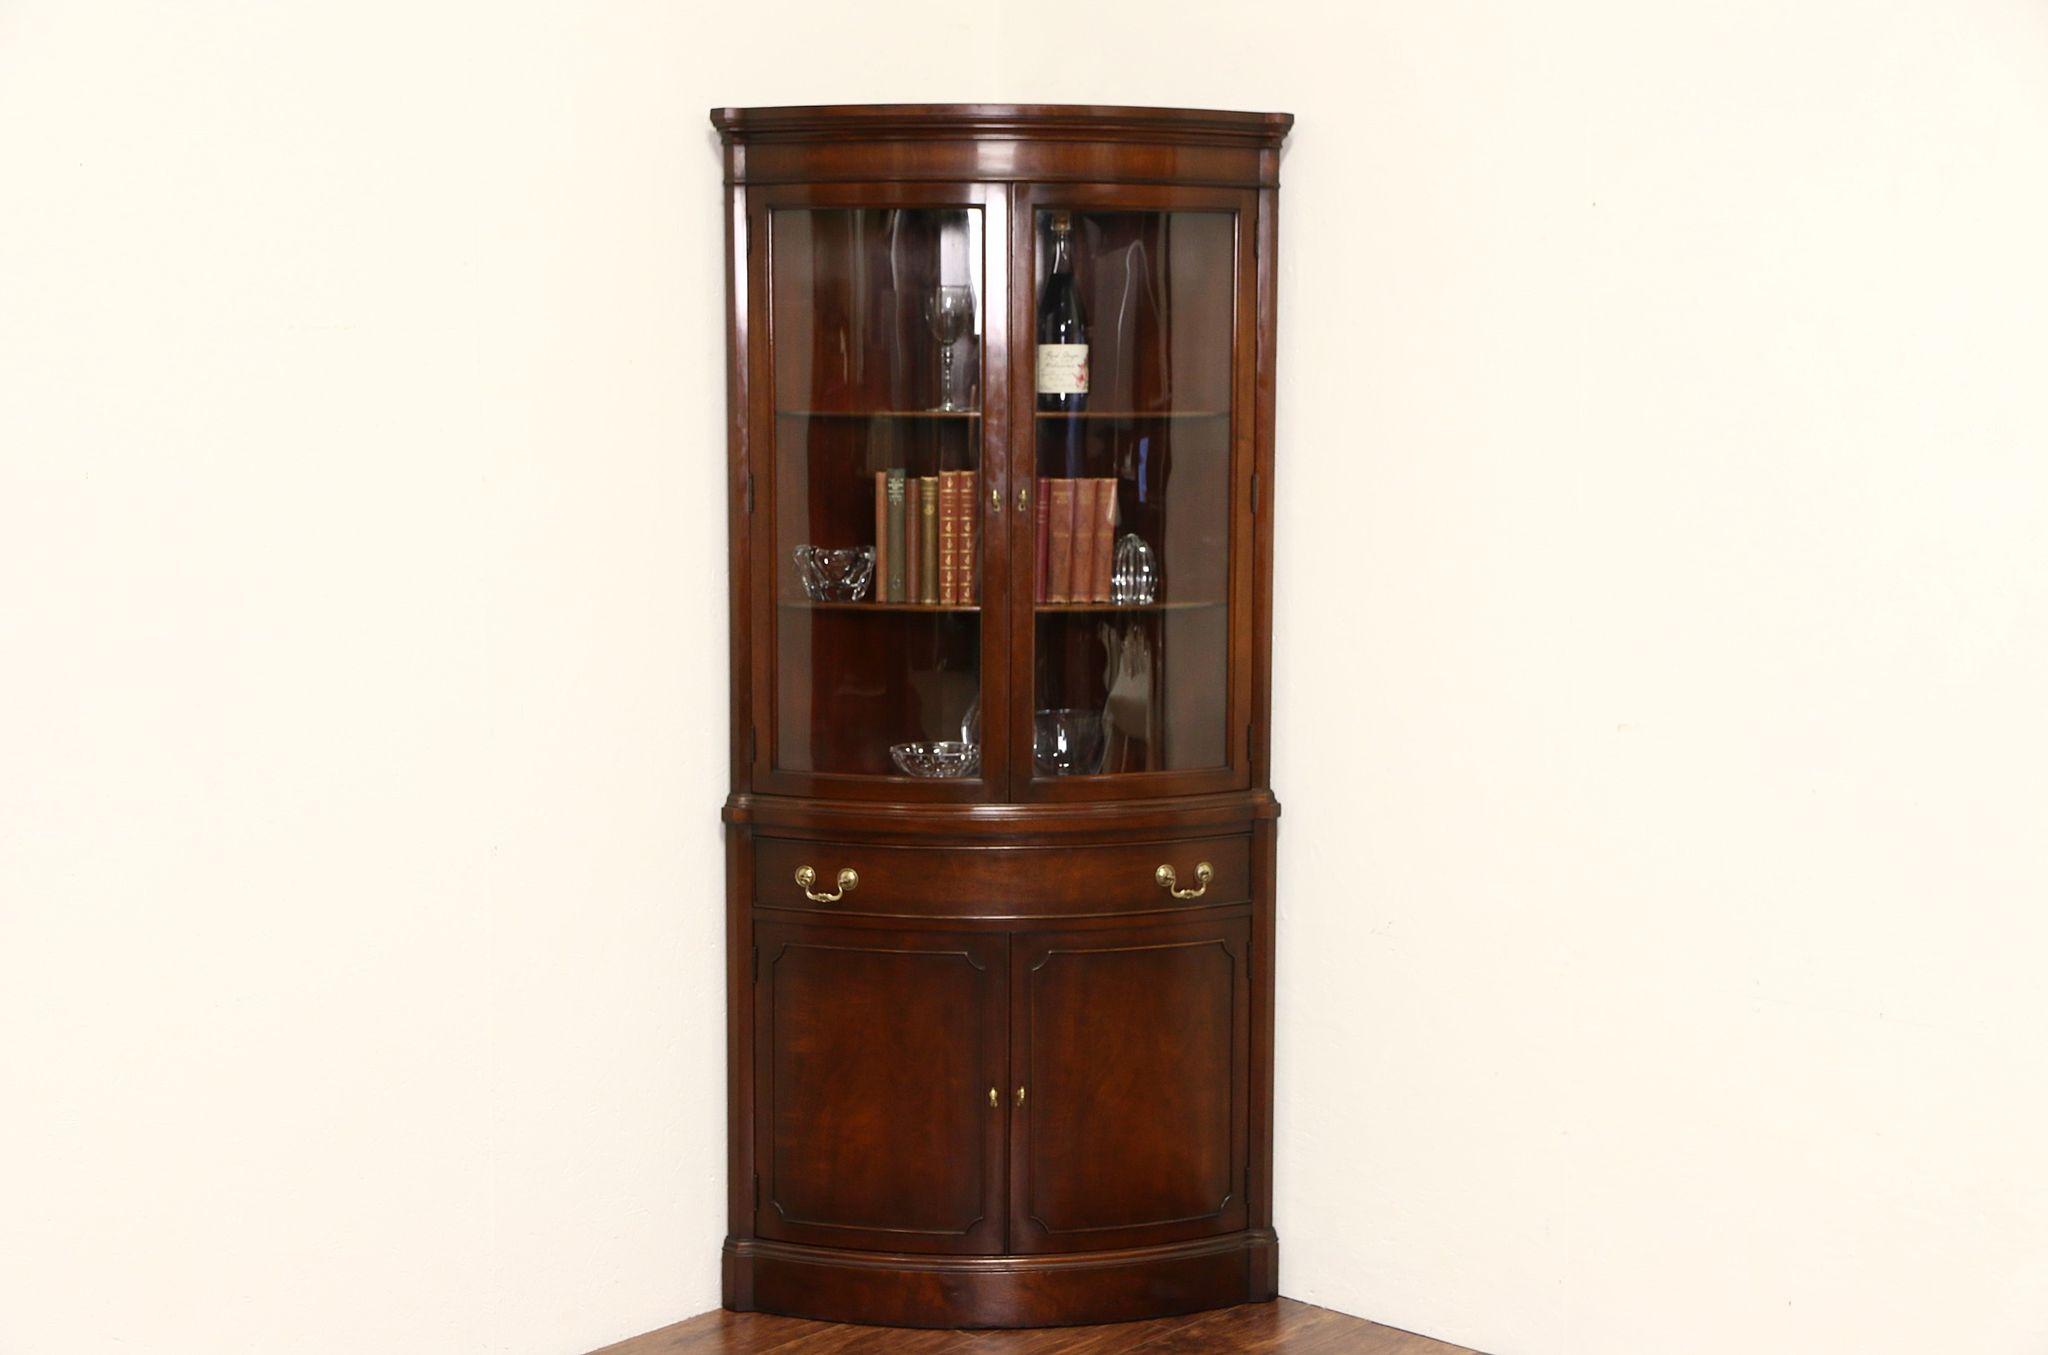 Sold Georgian Vintage Mahogany Curved Glass Corner Cabinet Signed Landstrom Harp Gallery